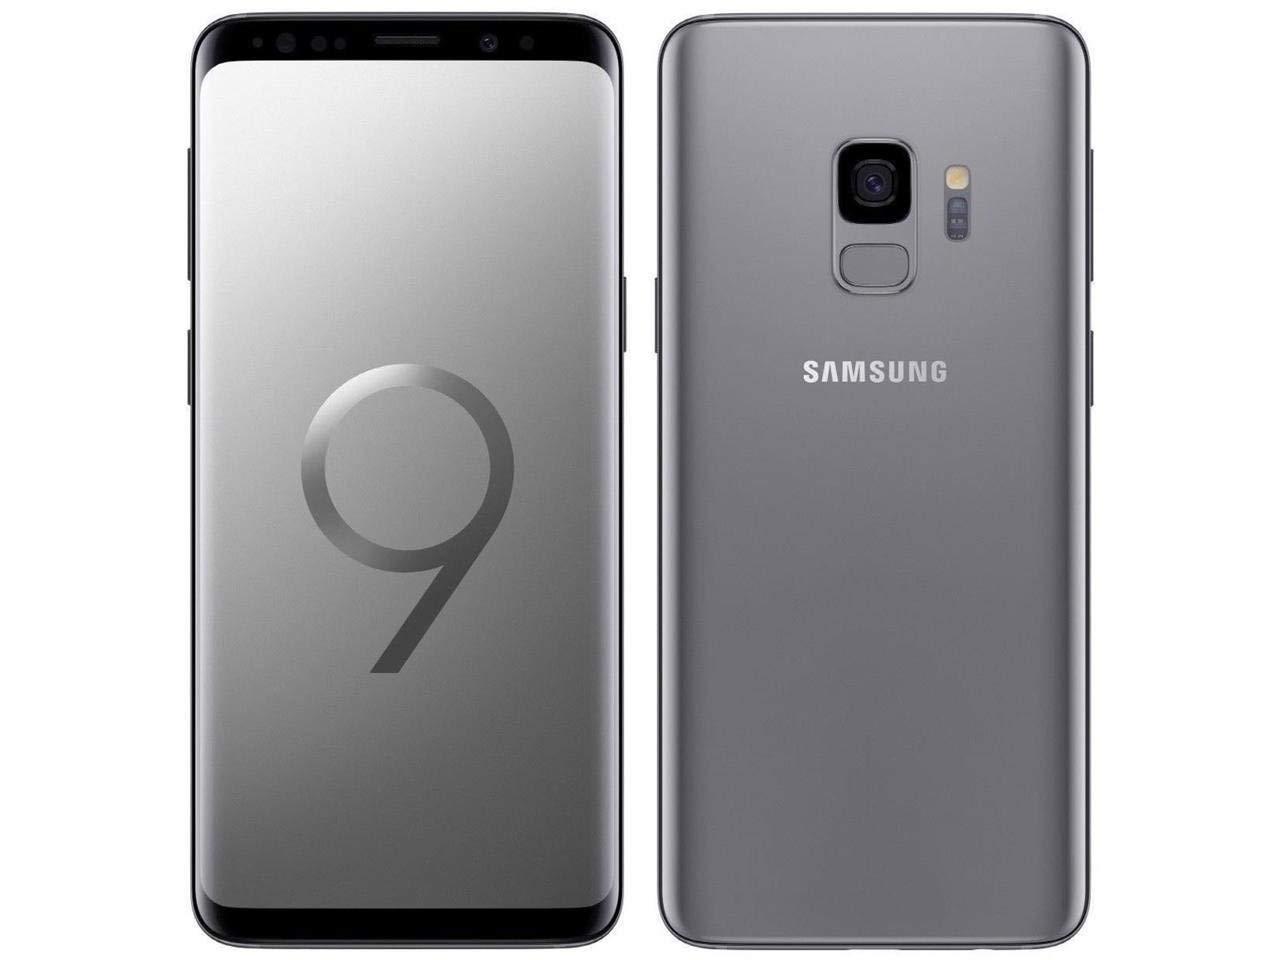 thumbnail 27 - Samsung-Galaxy-S9-SM-G960U-64GB-Factory-Unlocked-Android-Smartphone